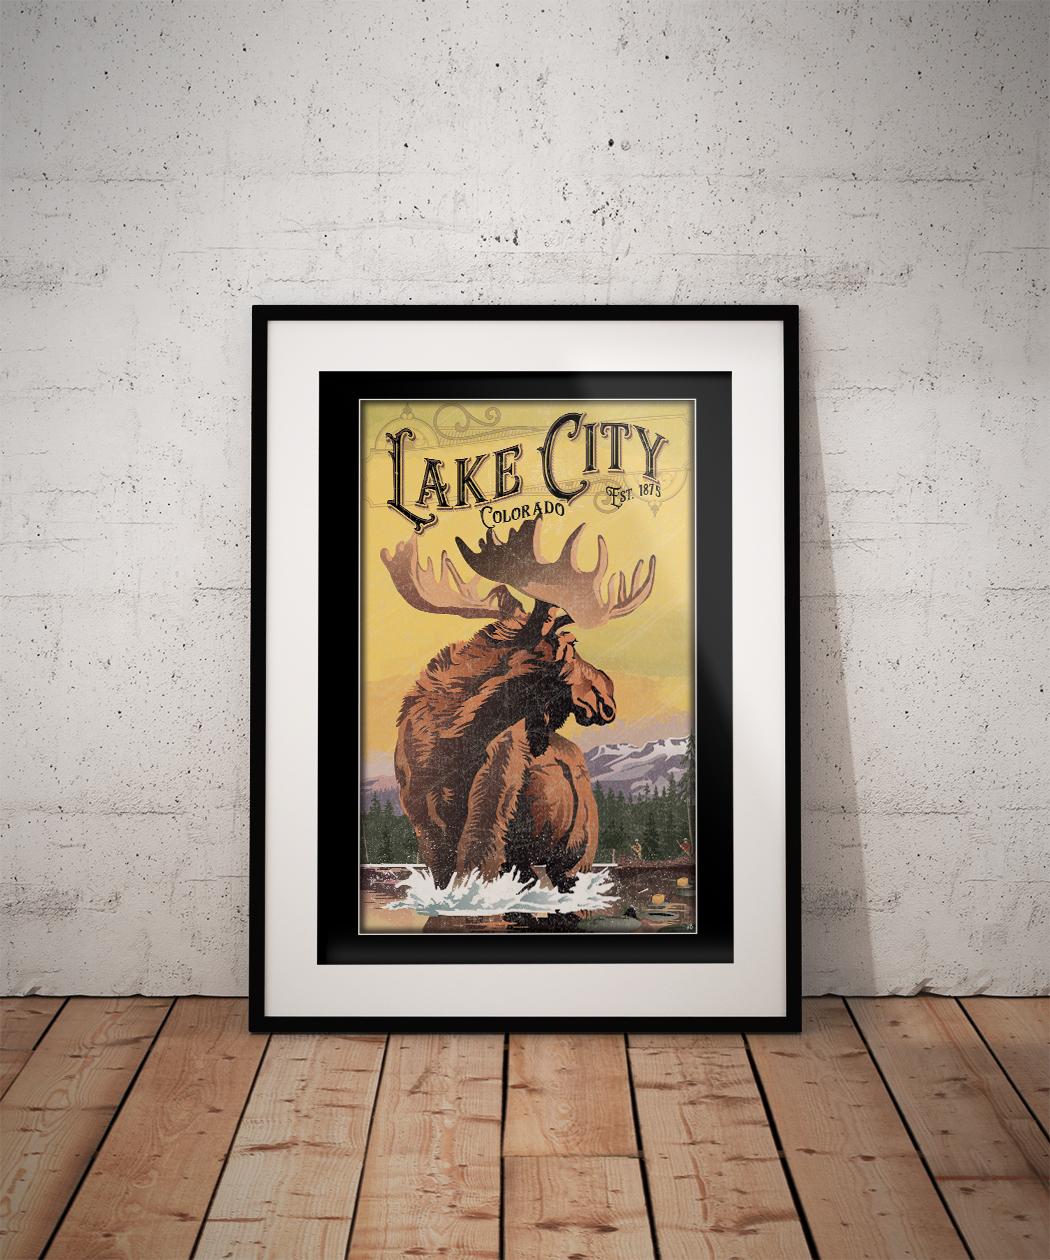 Mockup_Poster_Vertical High Country Moose Lake City.jpg